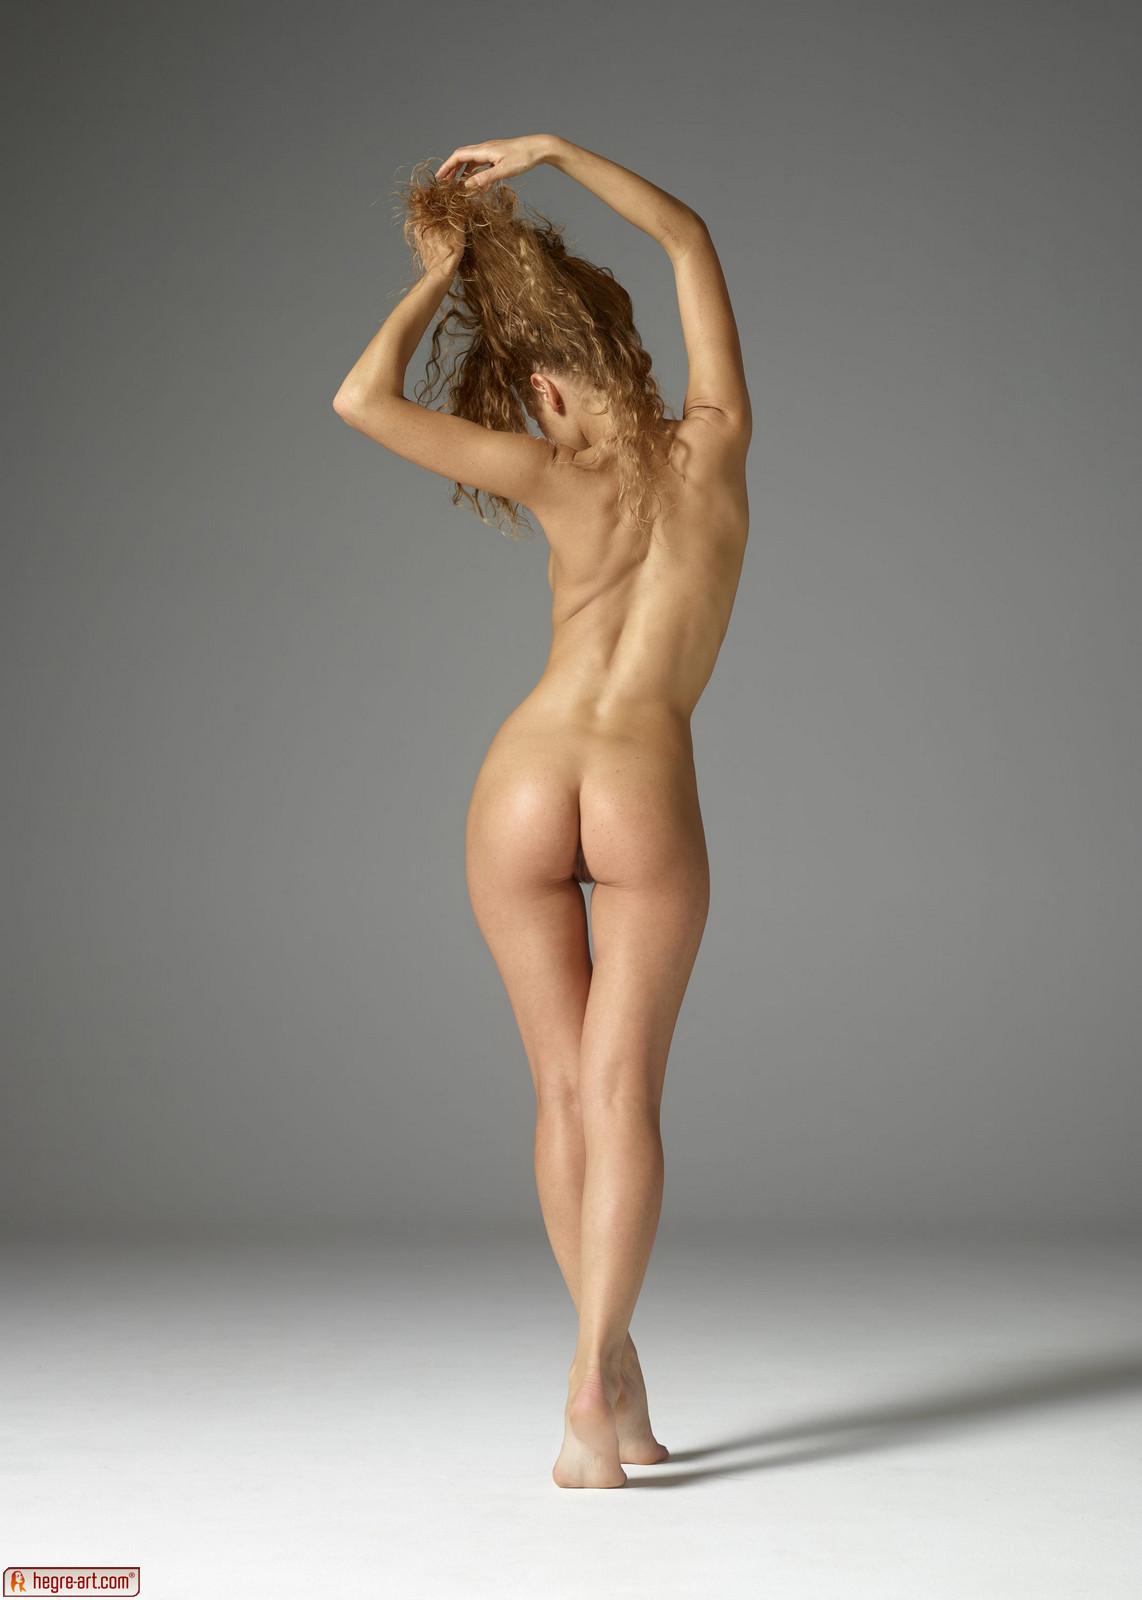 A japanese girl named mayuko posing nude